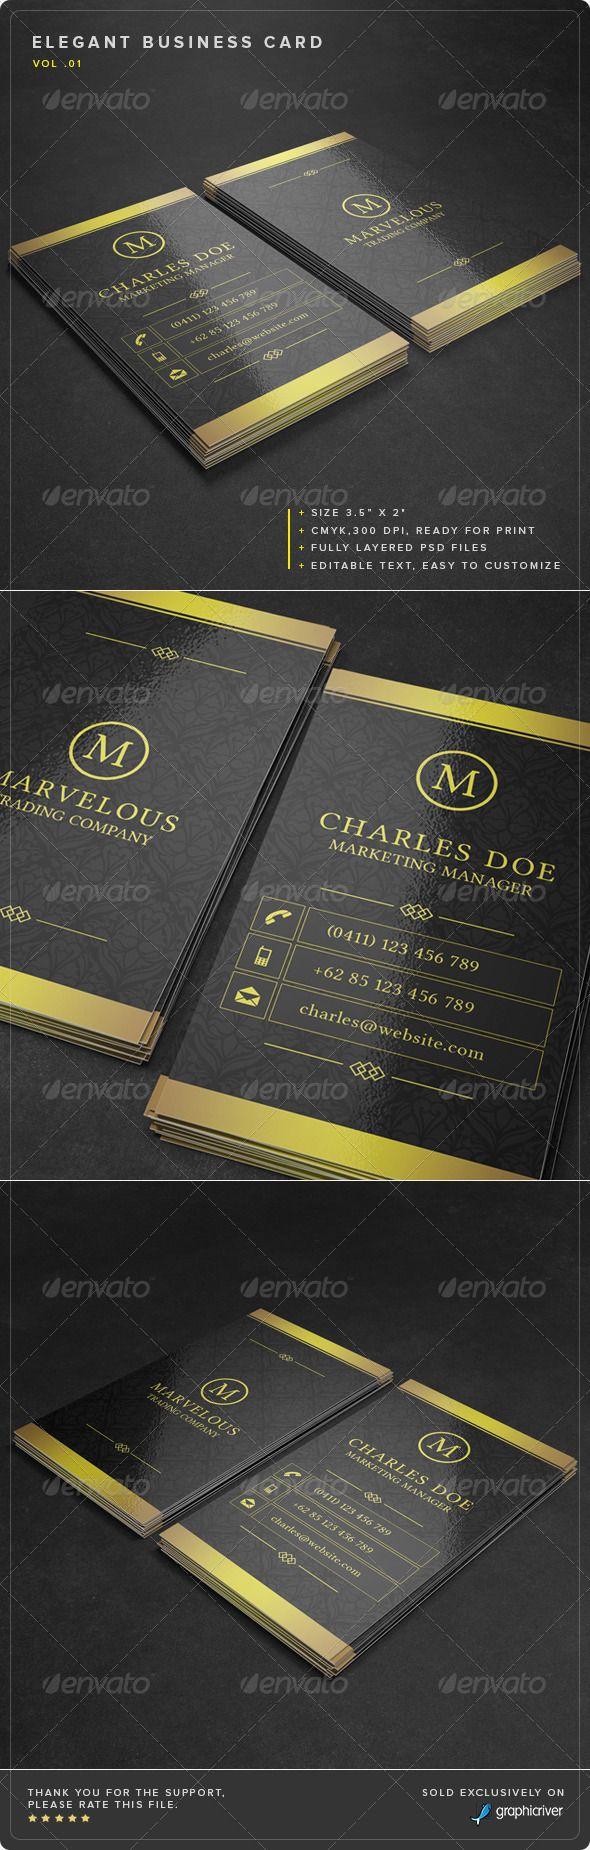 Elegant business card vol 01 elegant business cards business elegant business card vol 01 reheart Images